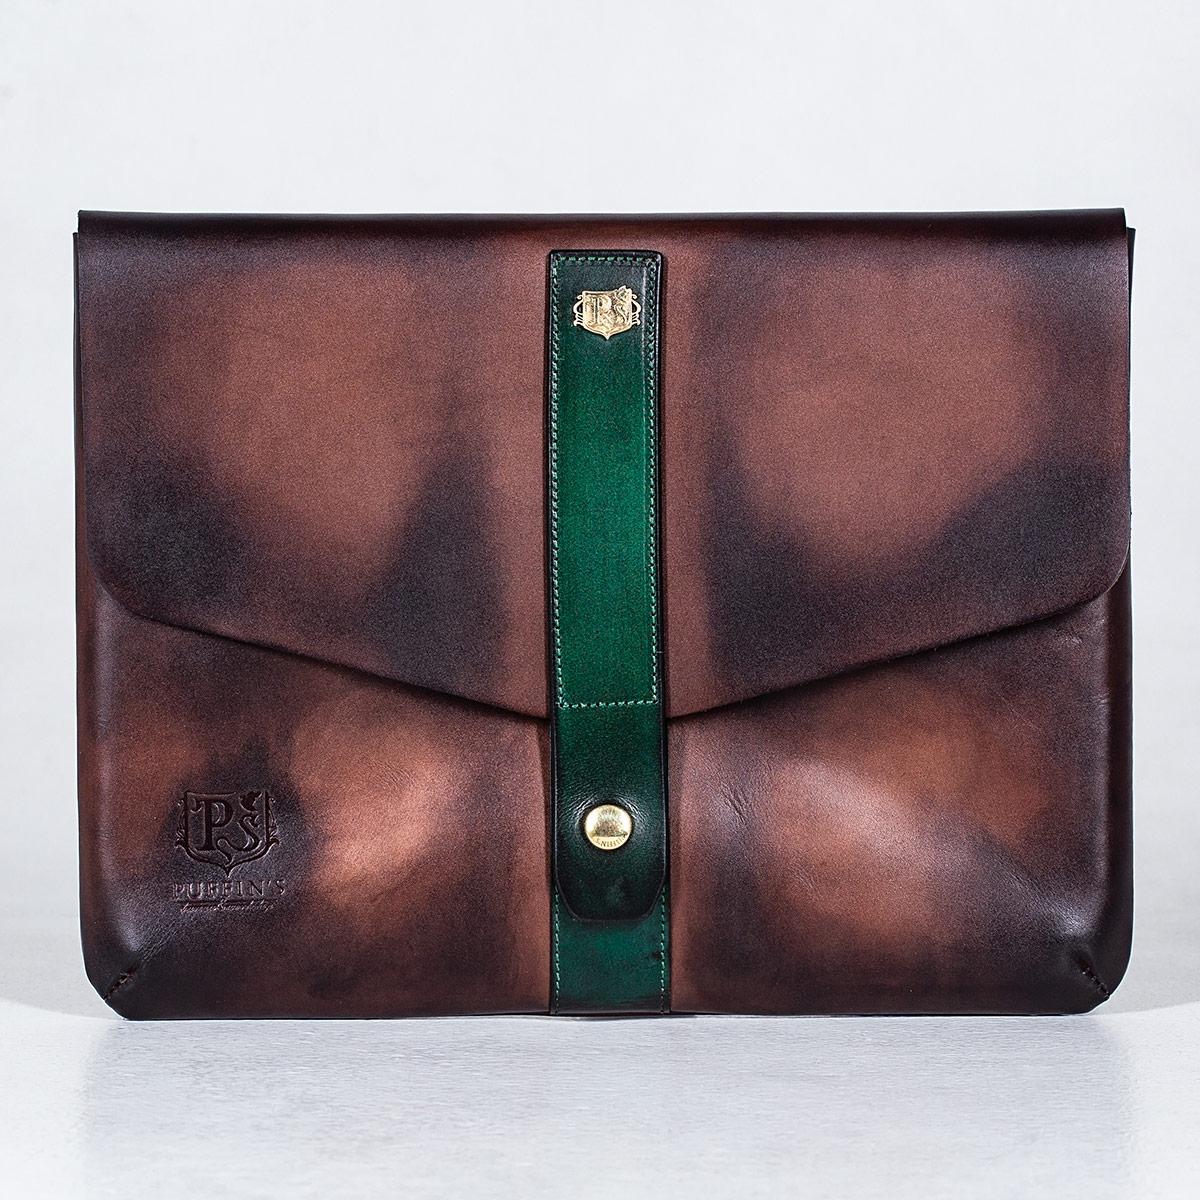 Document folder SOHO / 13'' MacBook case grassy green & chestnut